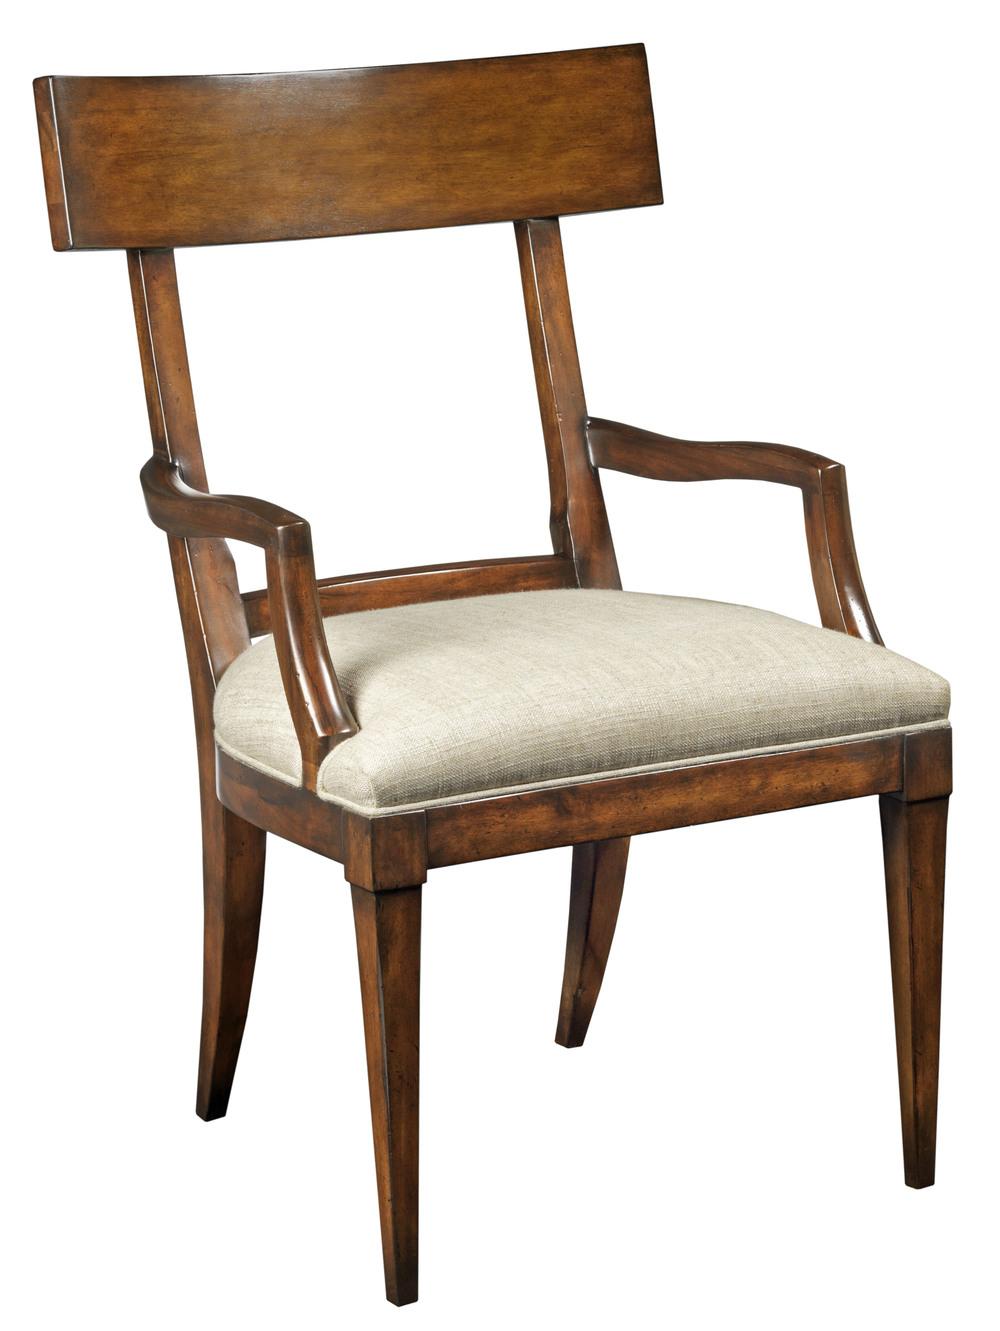 Woodbridge Furniture Company - Empire Arm Chair